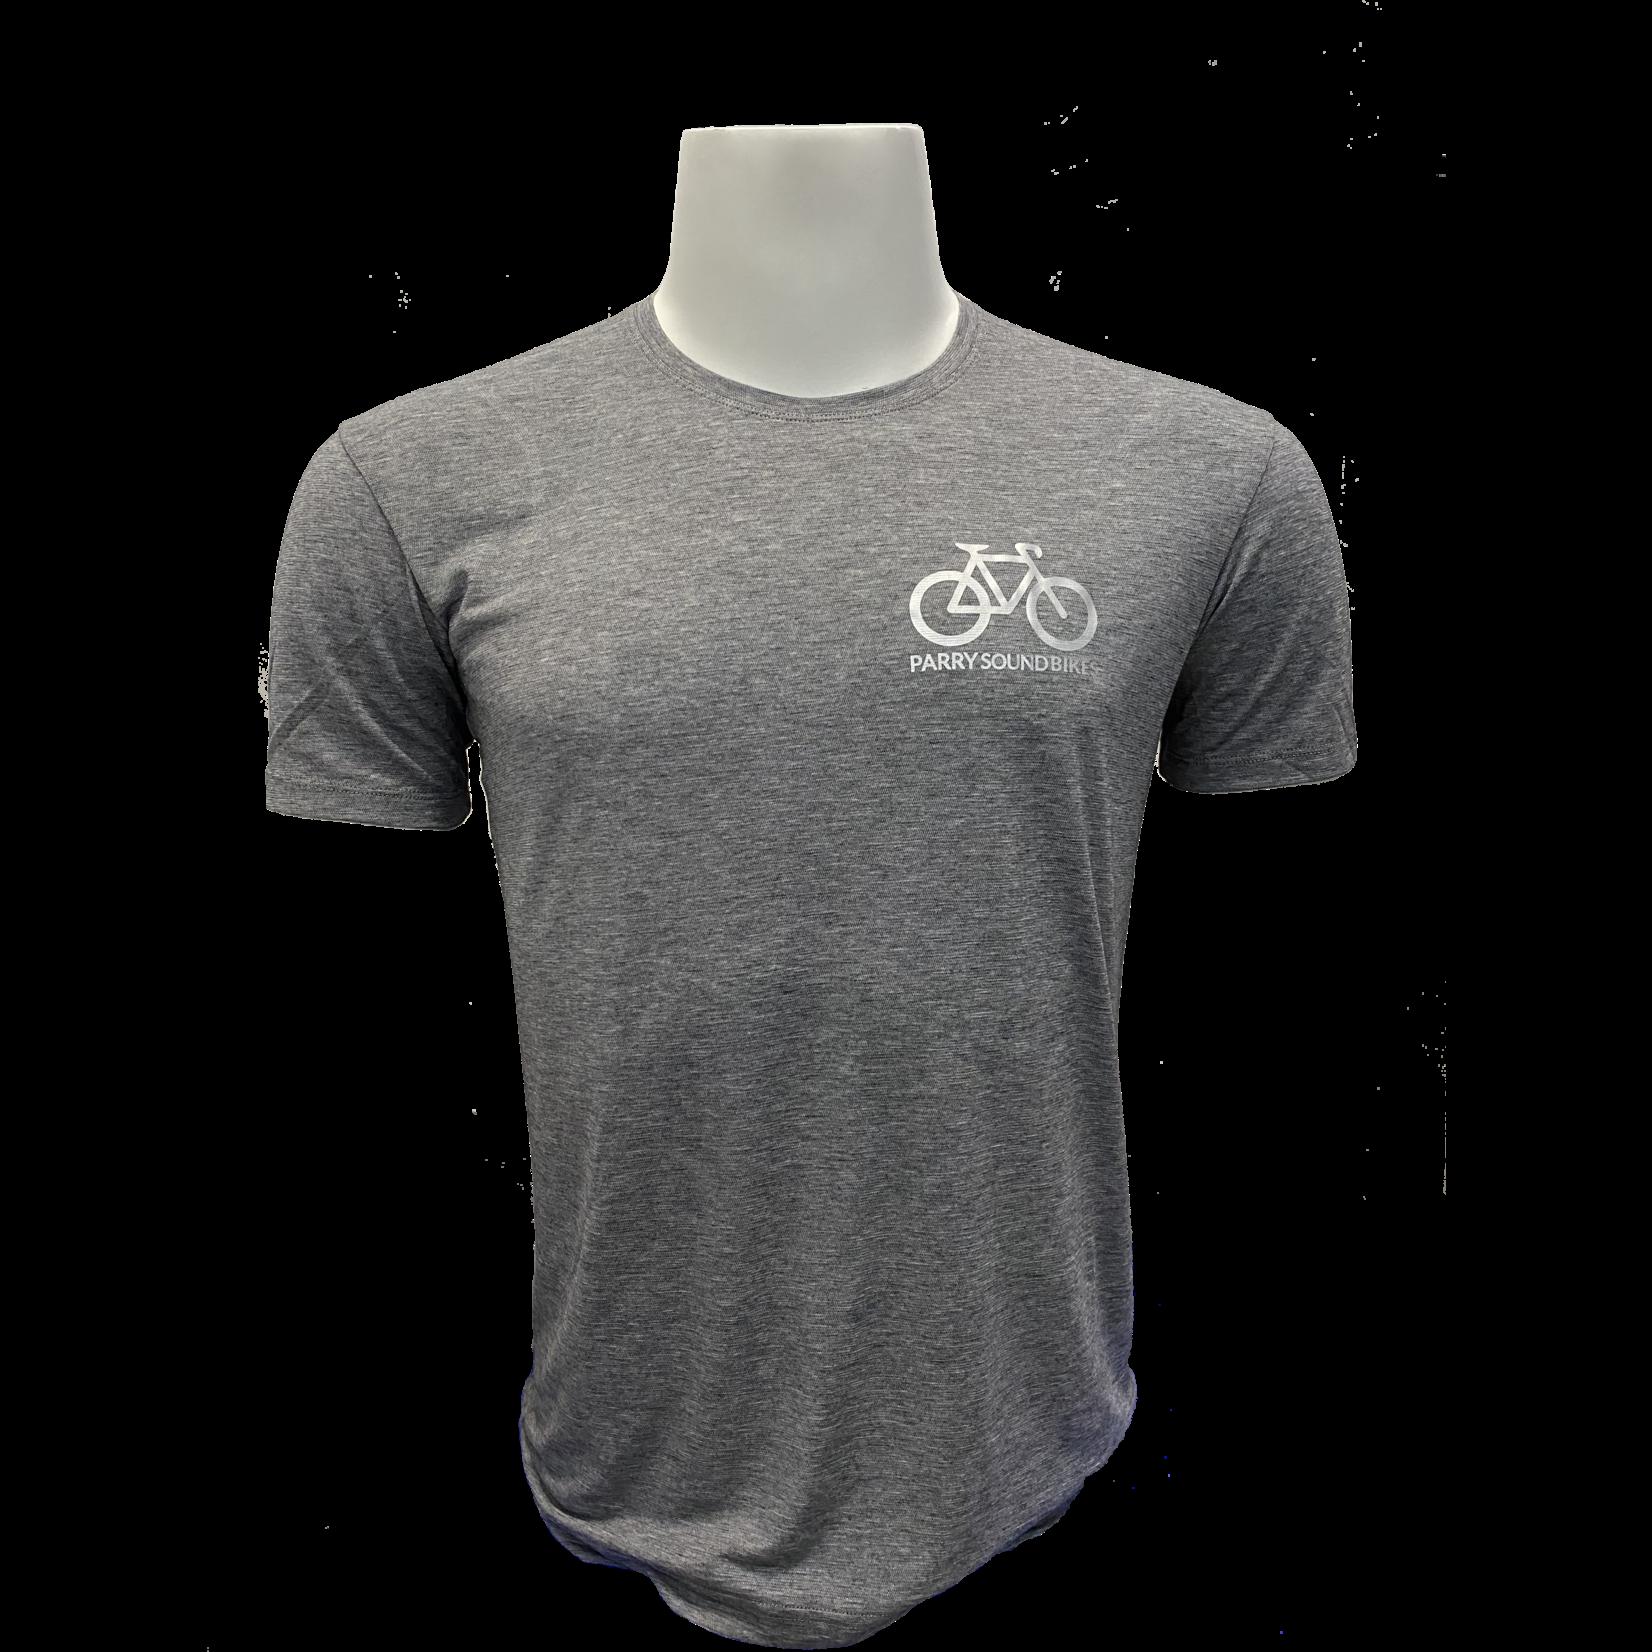 7Mesh 7Mesh Elevate T-Shirt (with Parry Sound Bikes Logo) Men's